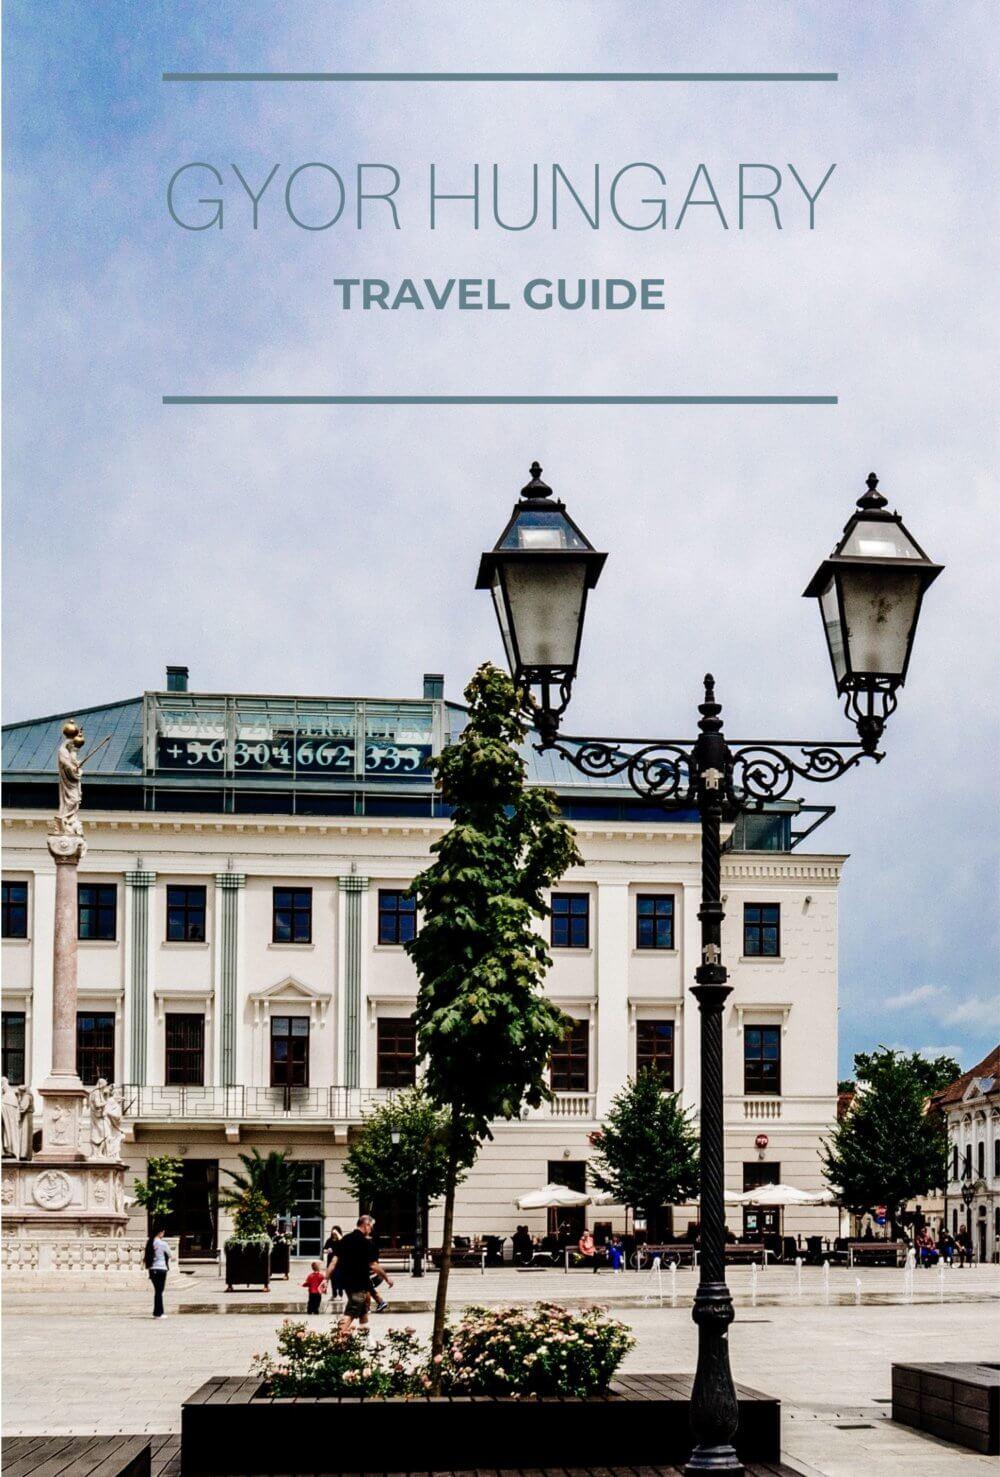 Gyor Hungary Travel Guide